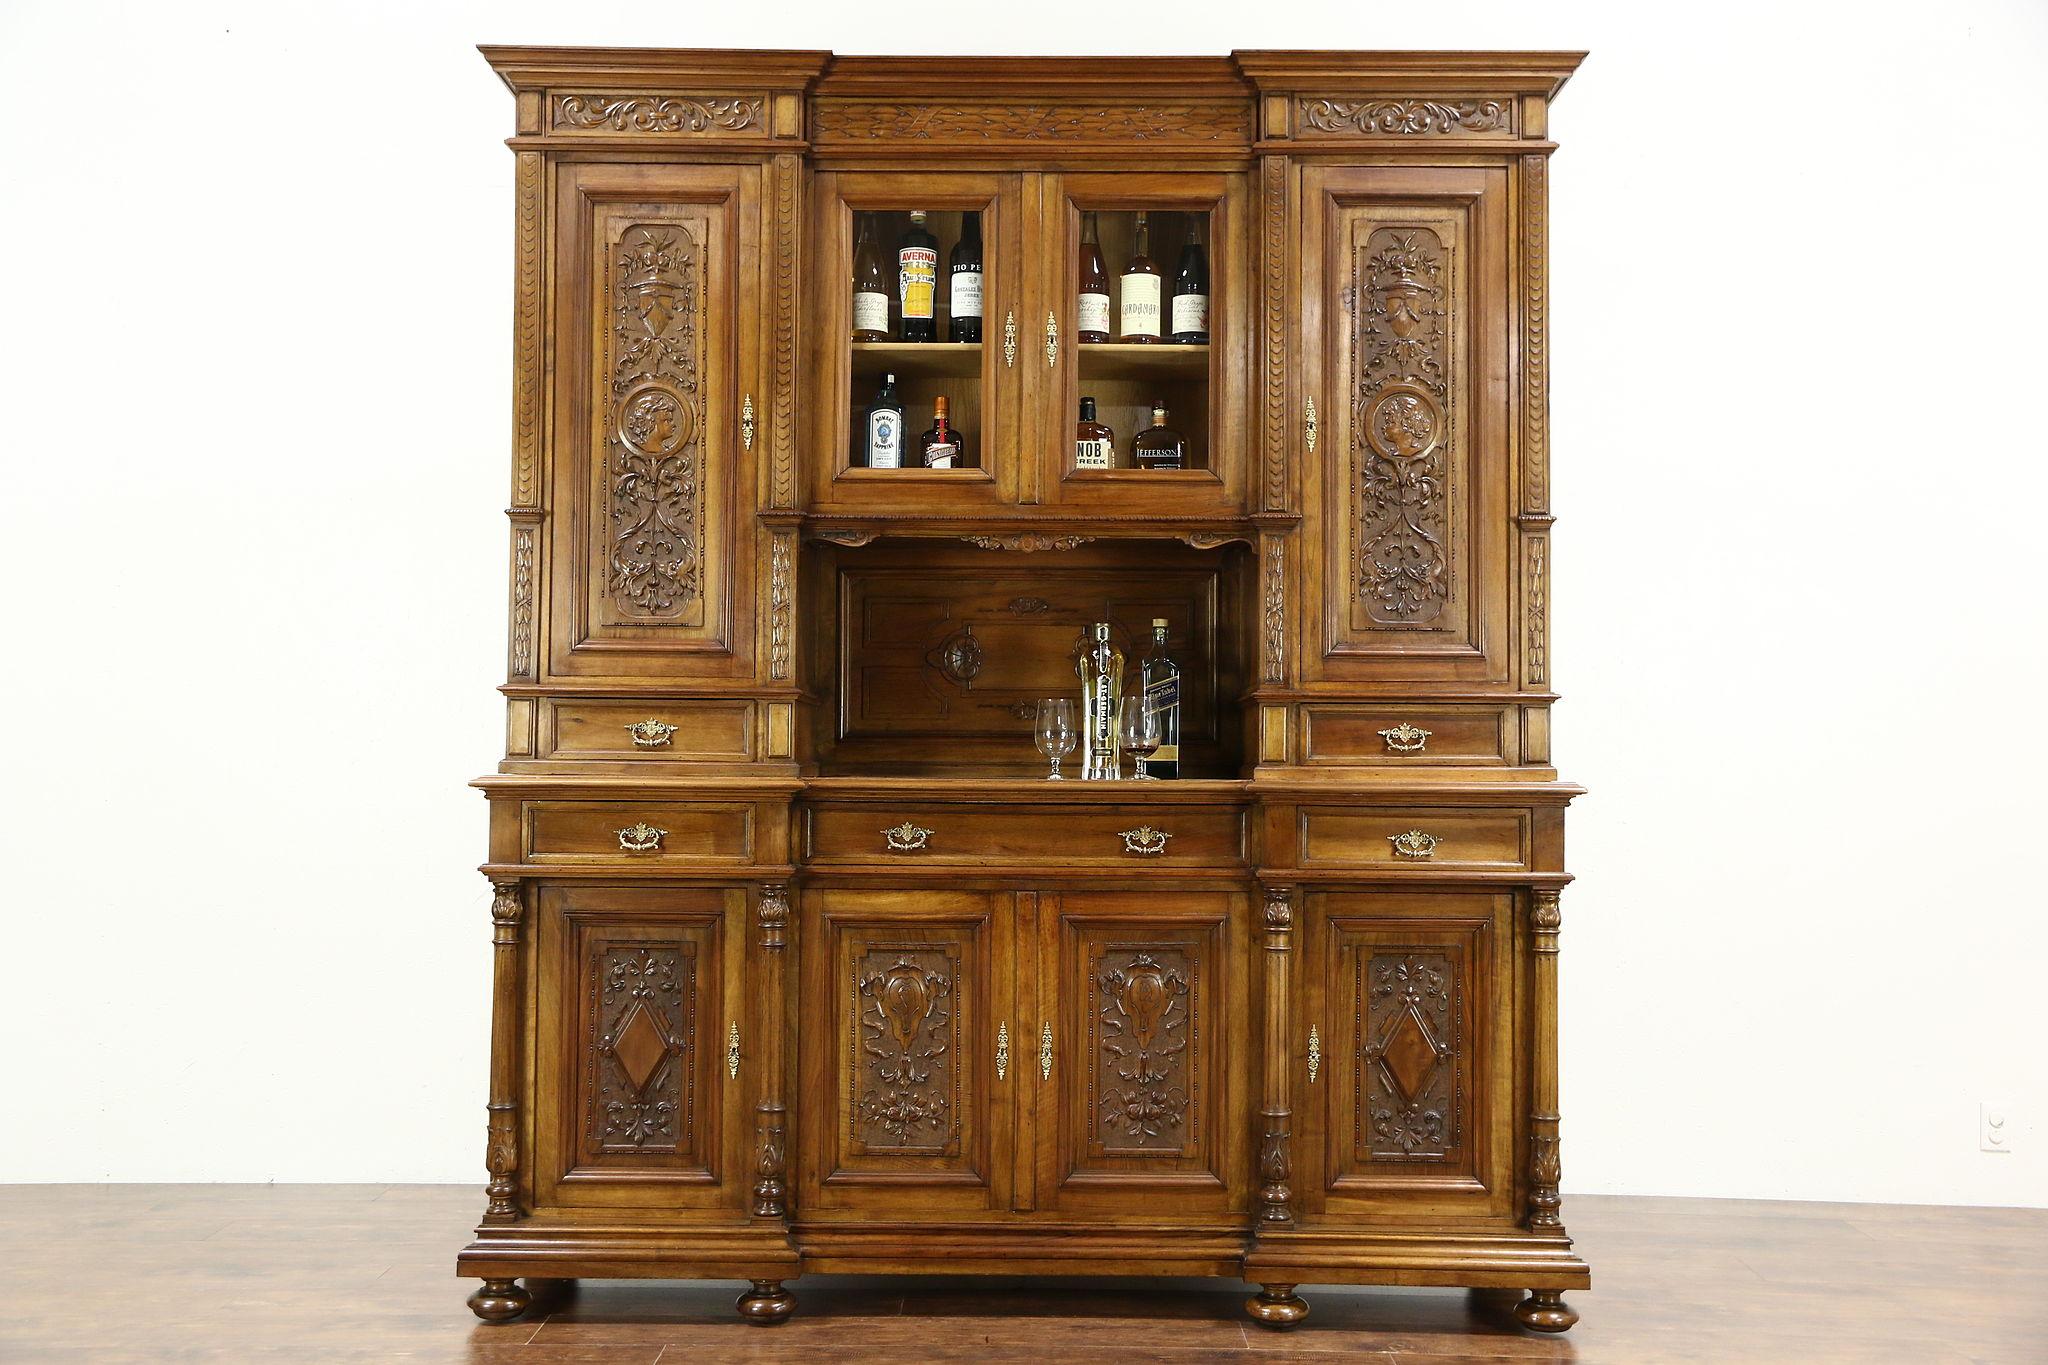 Dining Room & Kitchen - Harp Gallery Antique Furniture